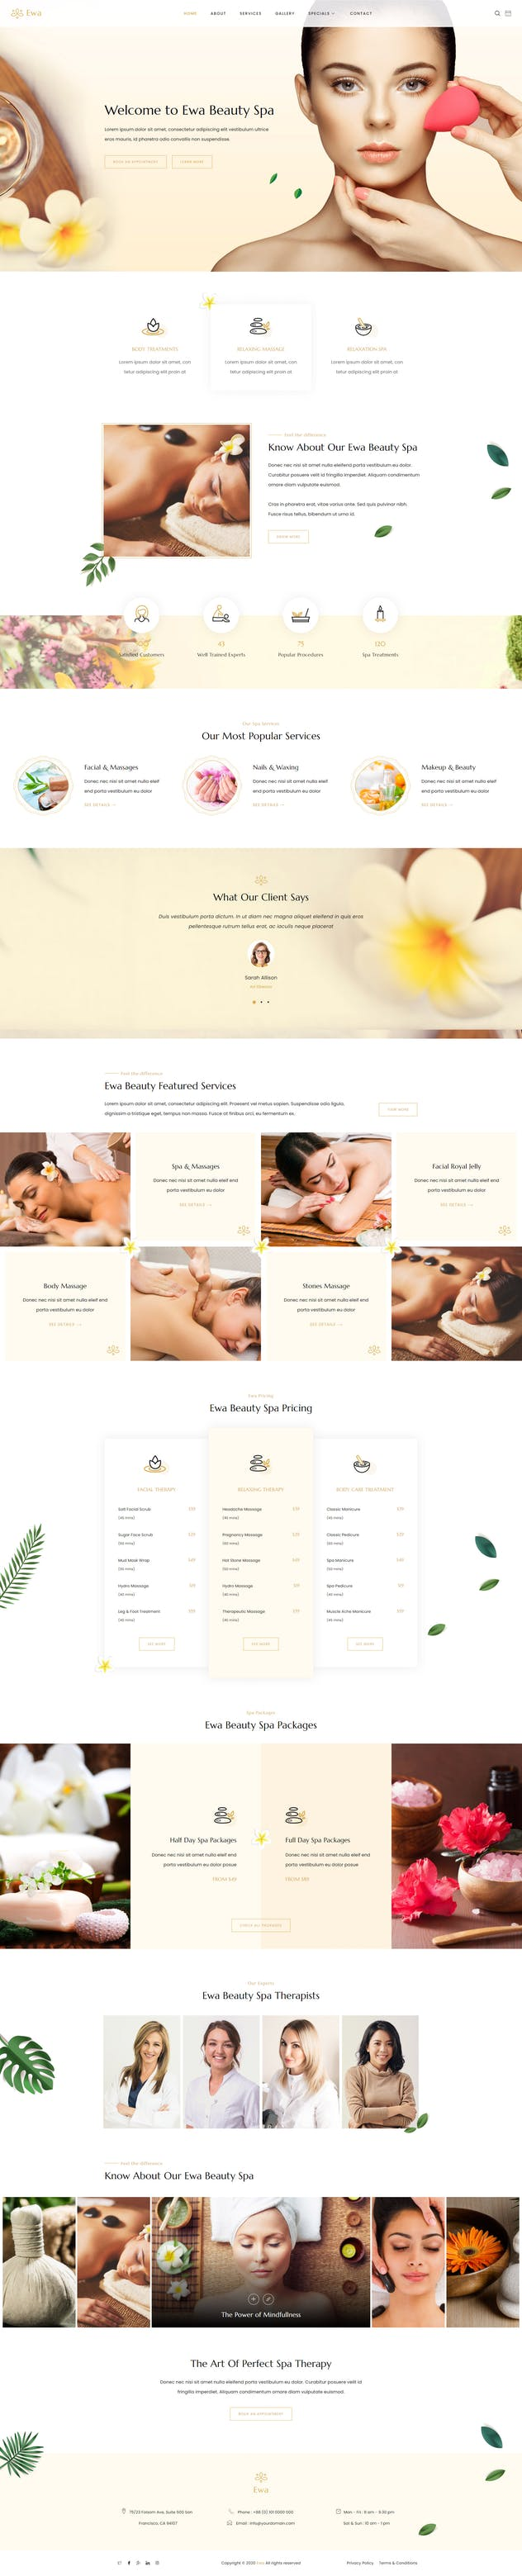 Ewa - Beauty & Spa Salon Elementor Template Kit - product preview 2